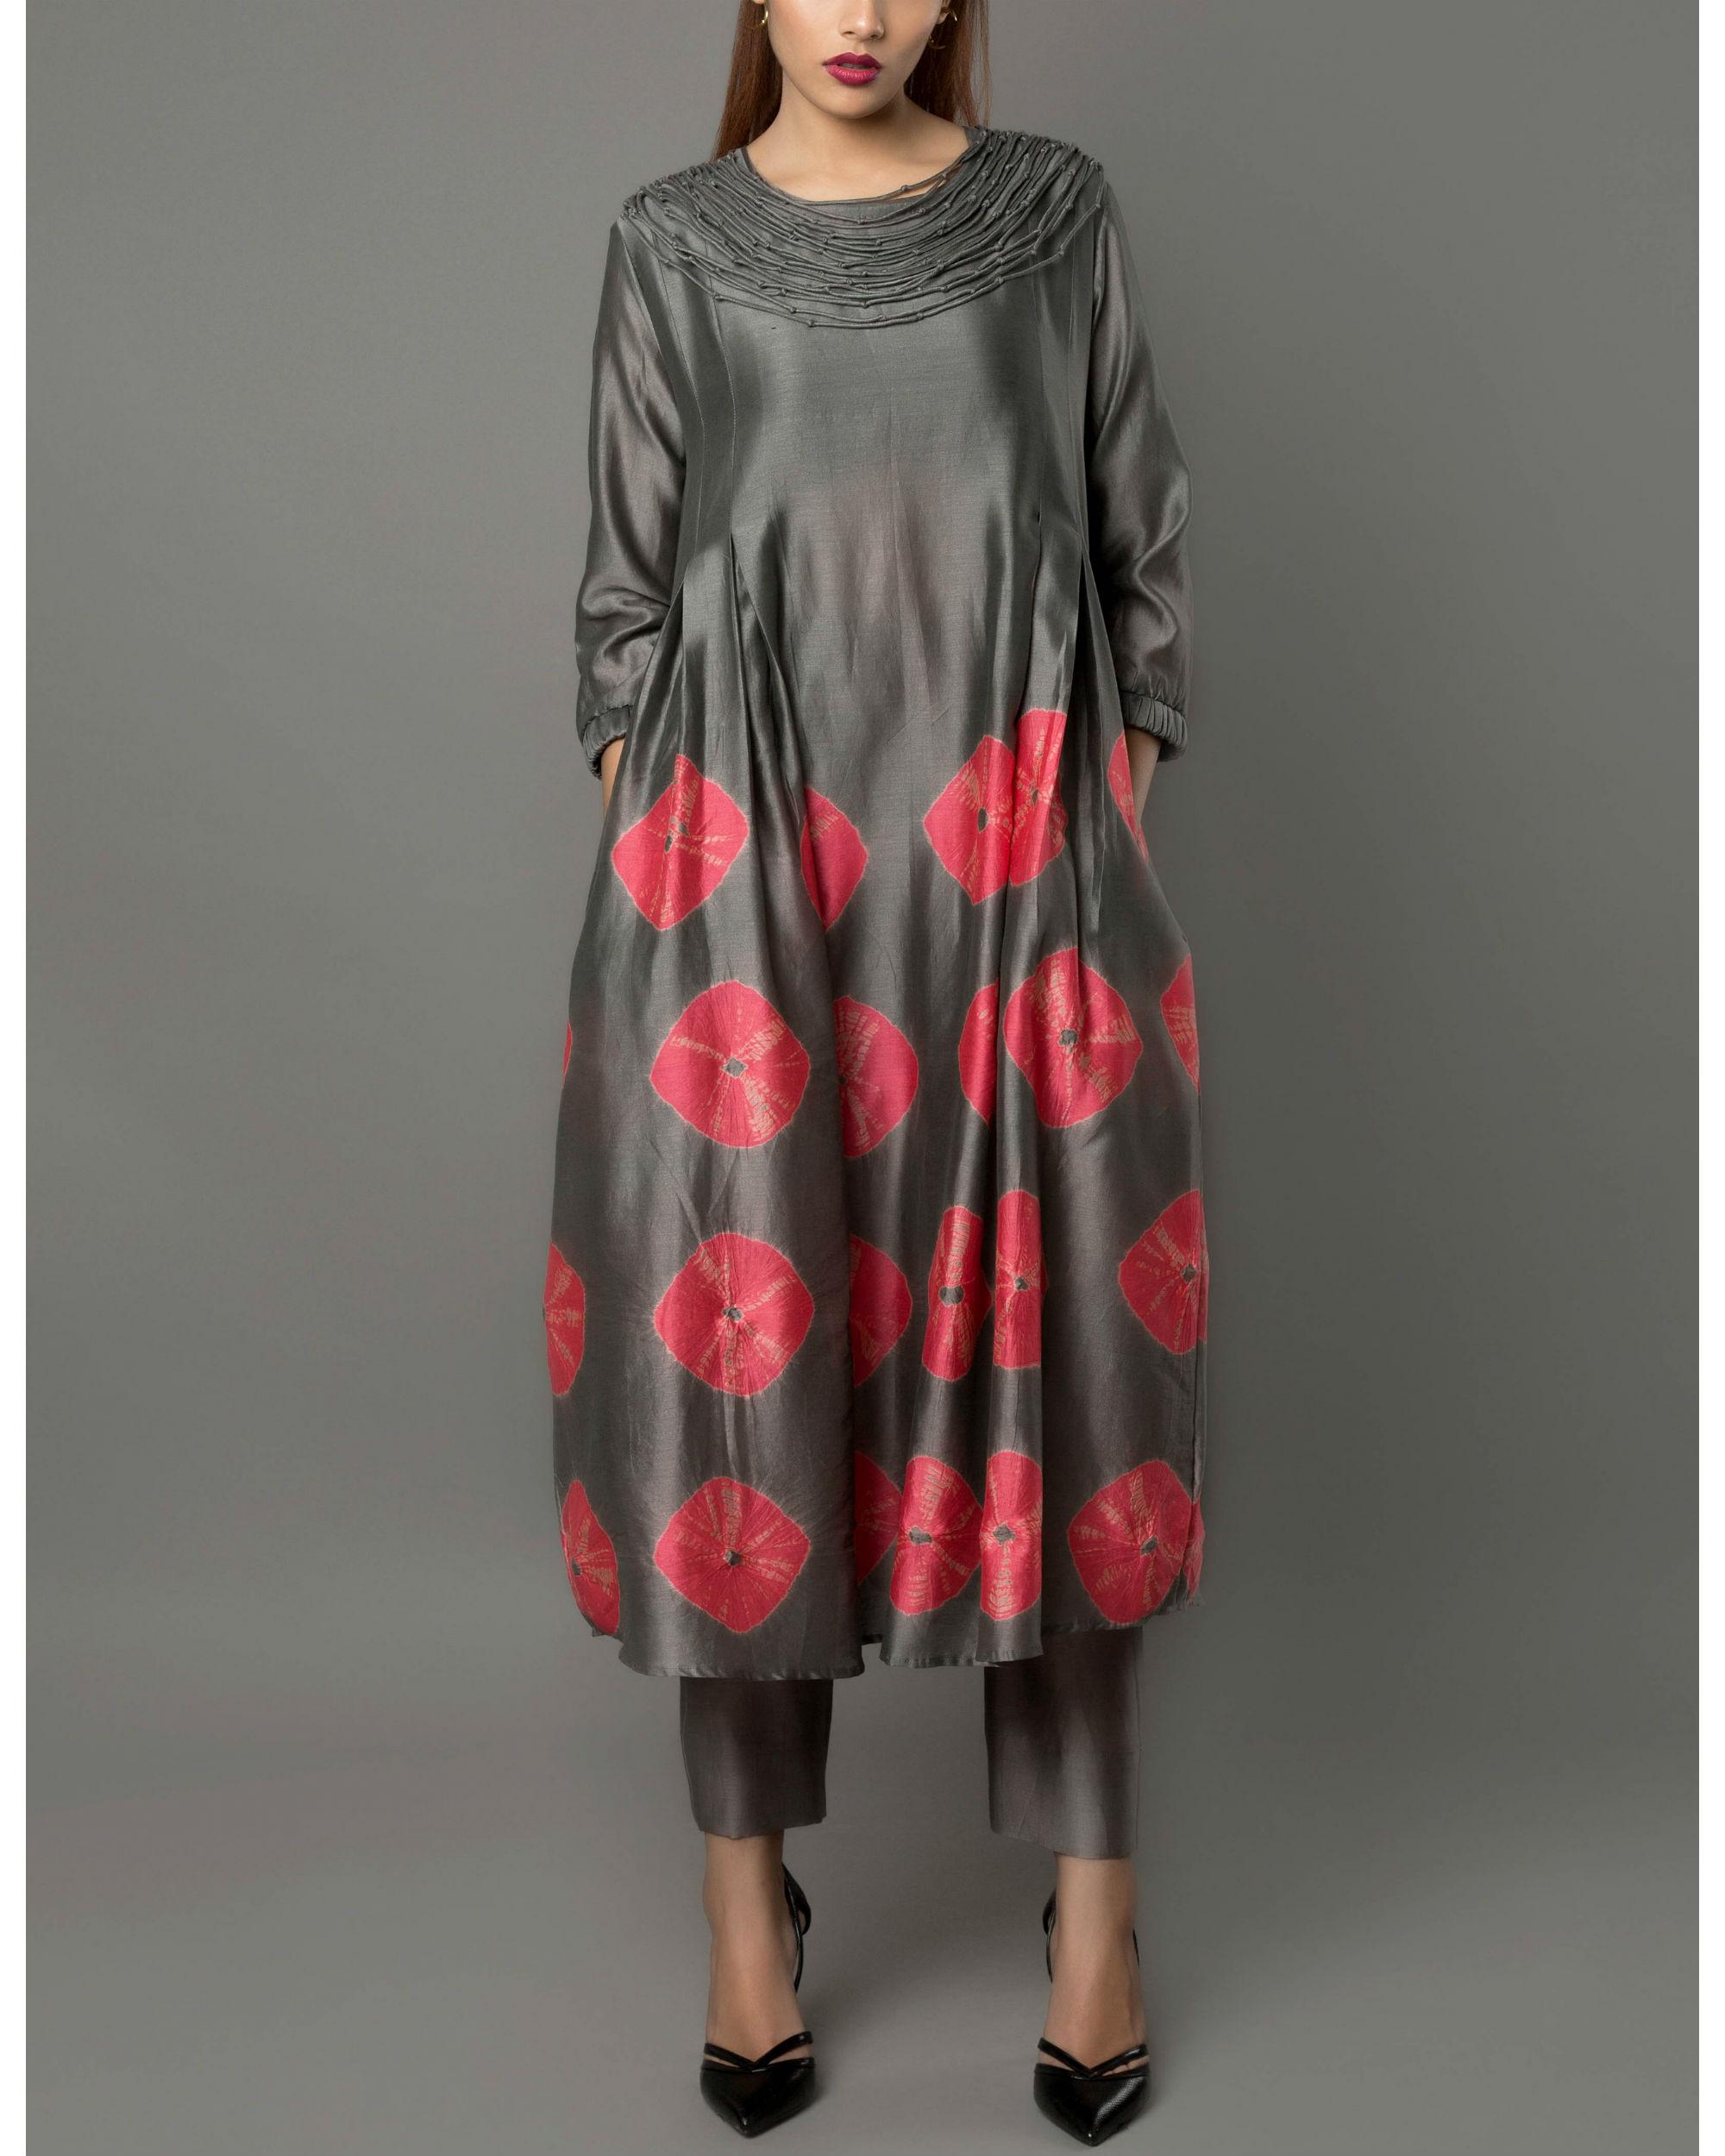 Shiba grey tunic